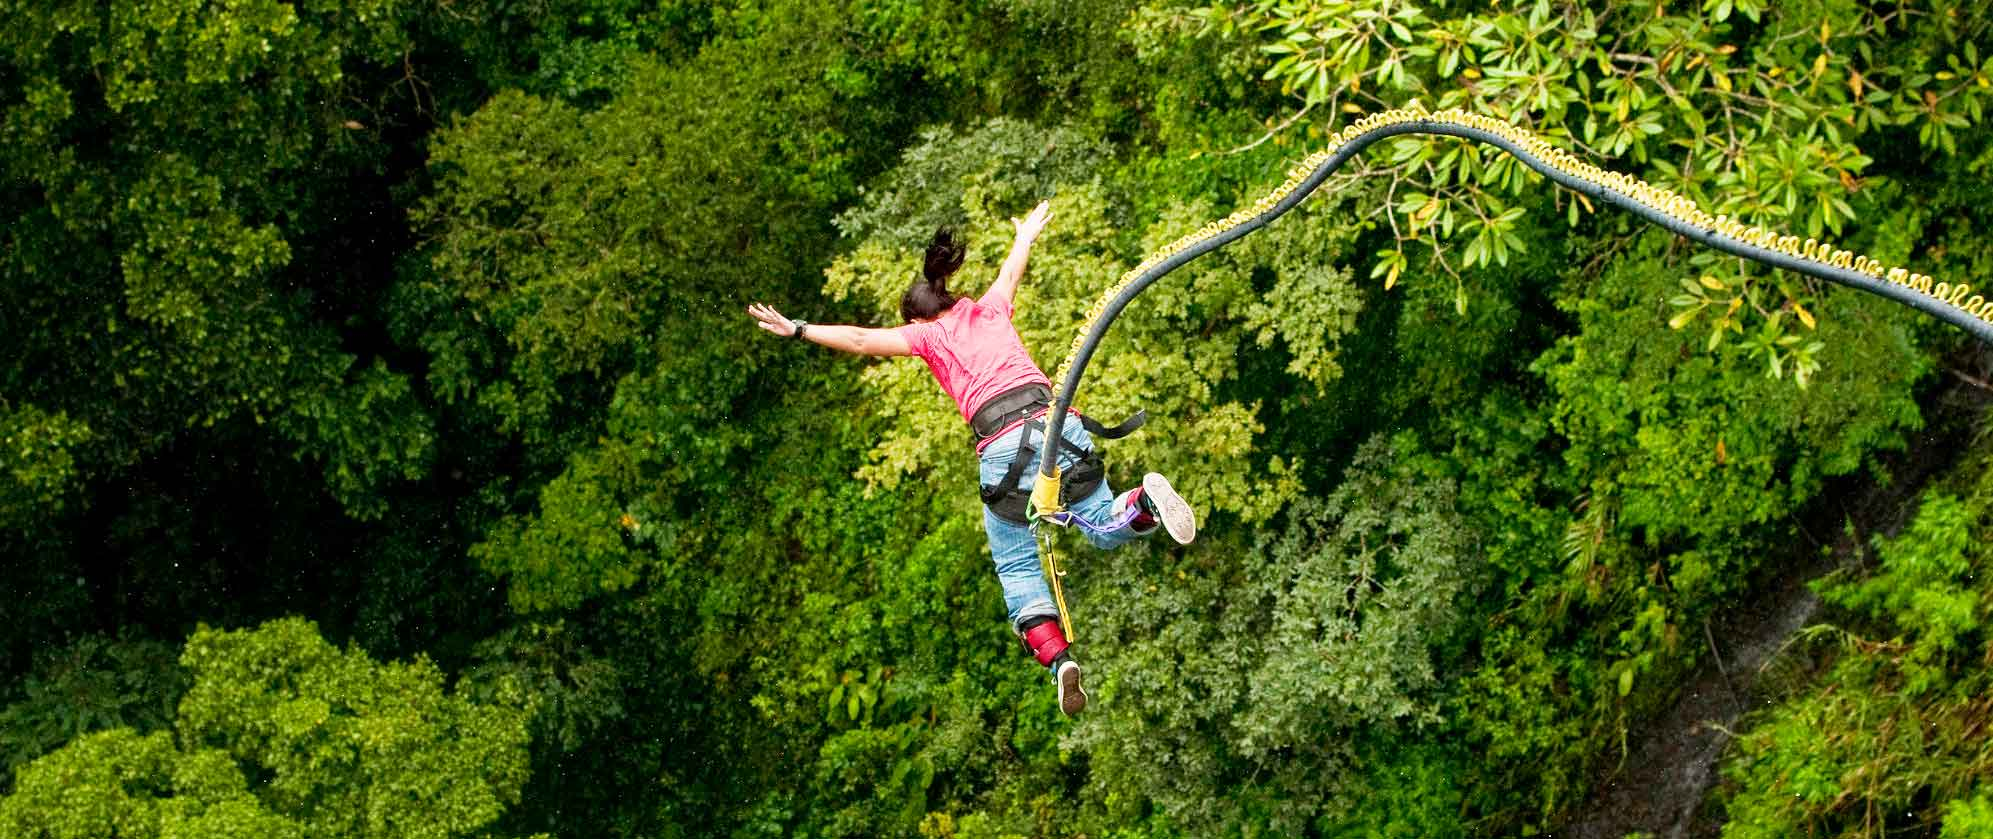 Bungee-jumping-nepal